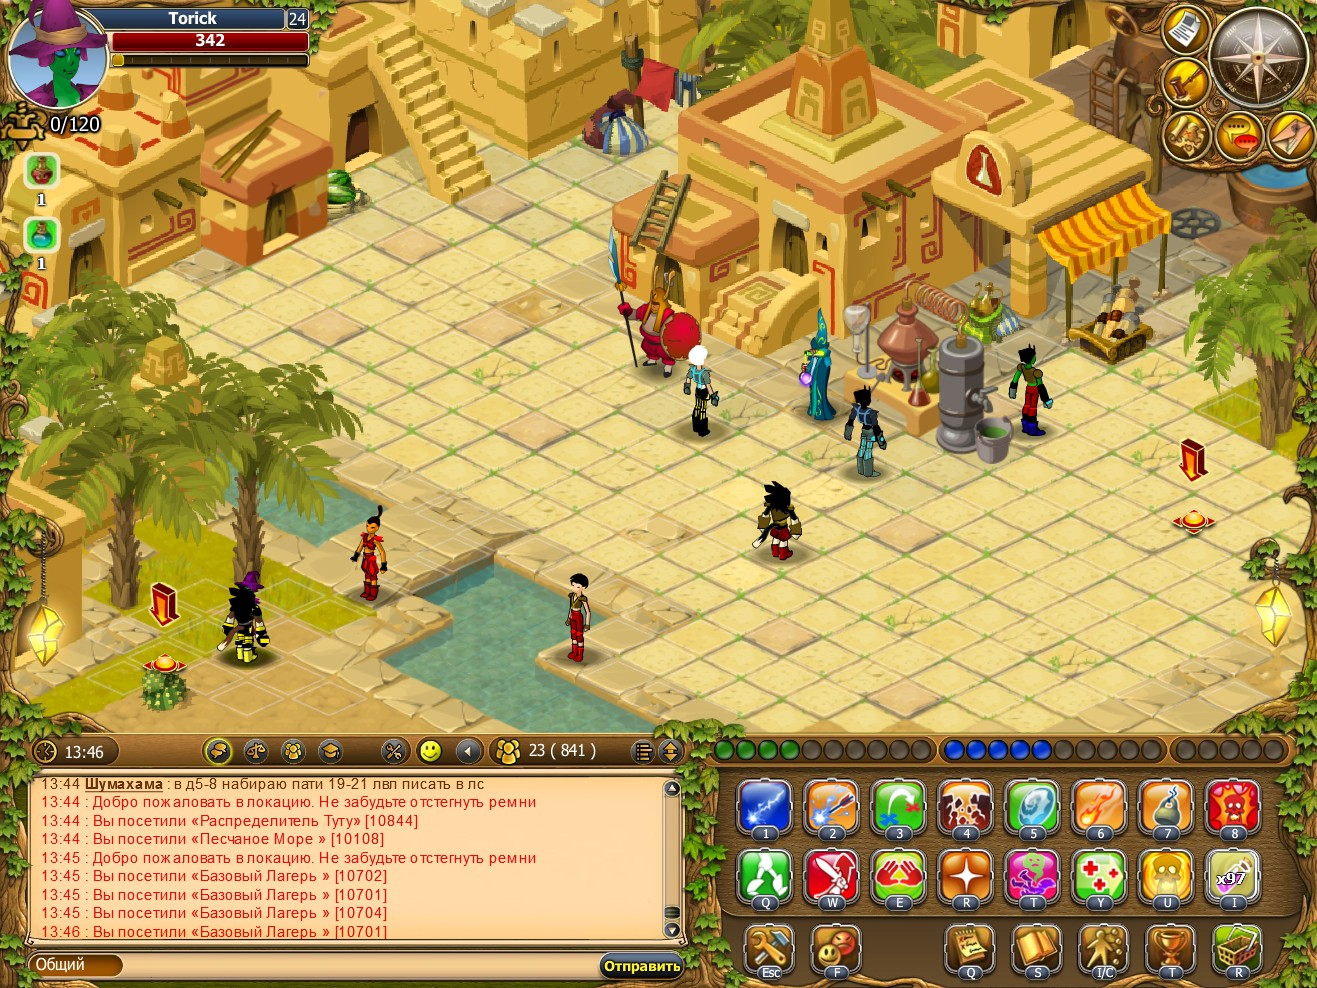 Магия онлайн игры